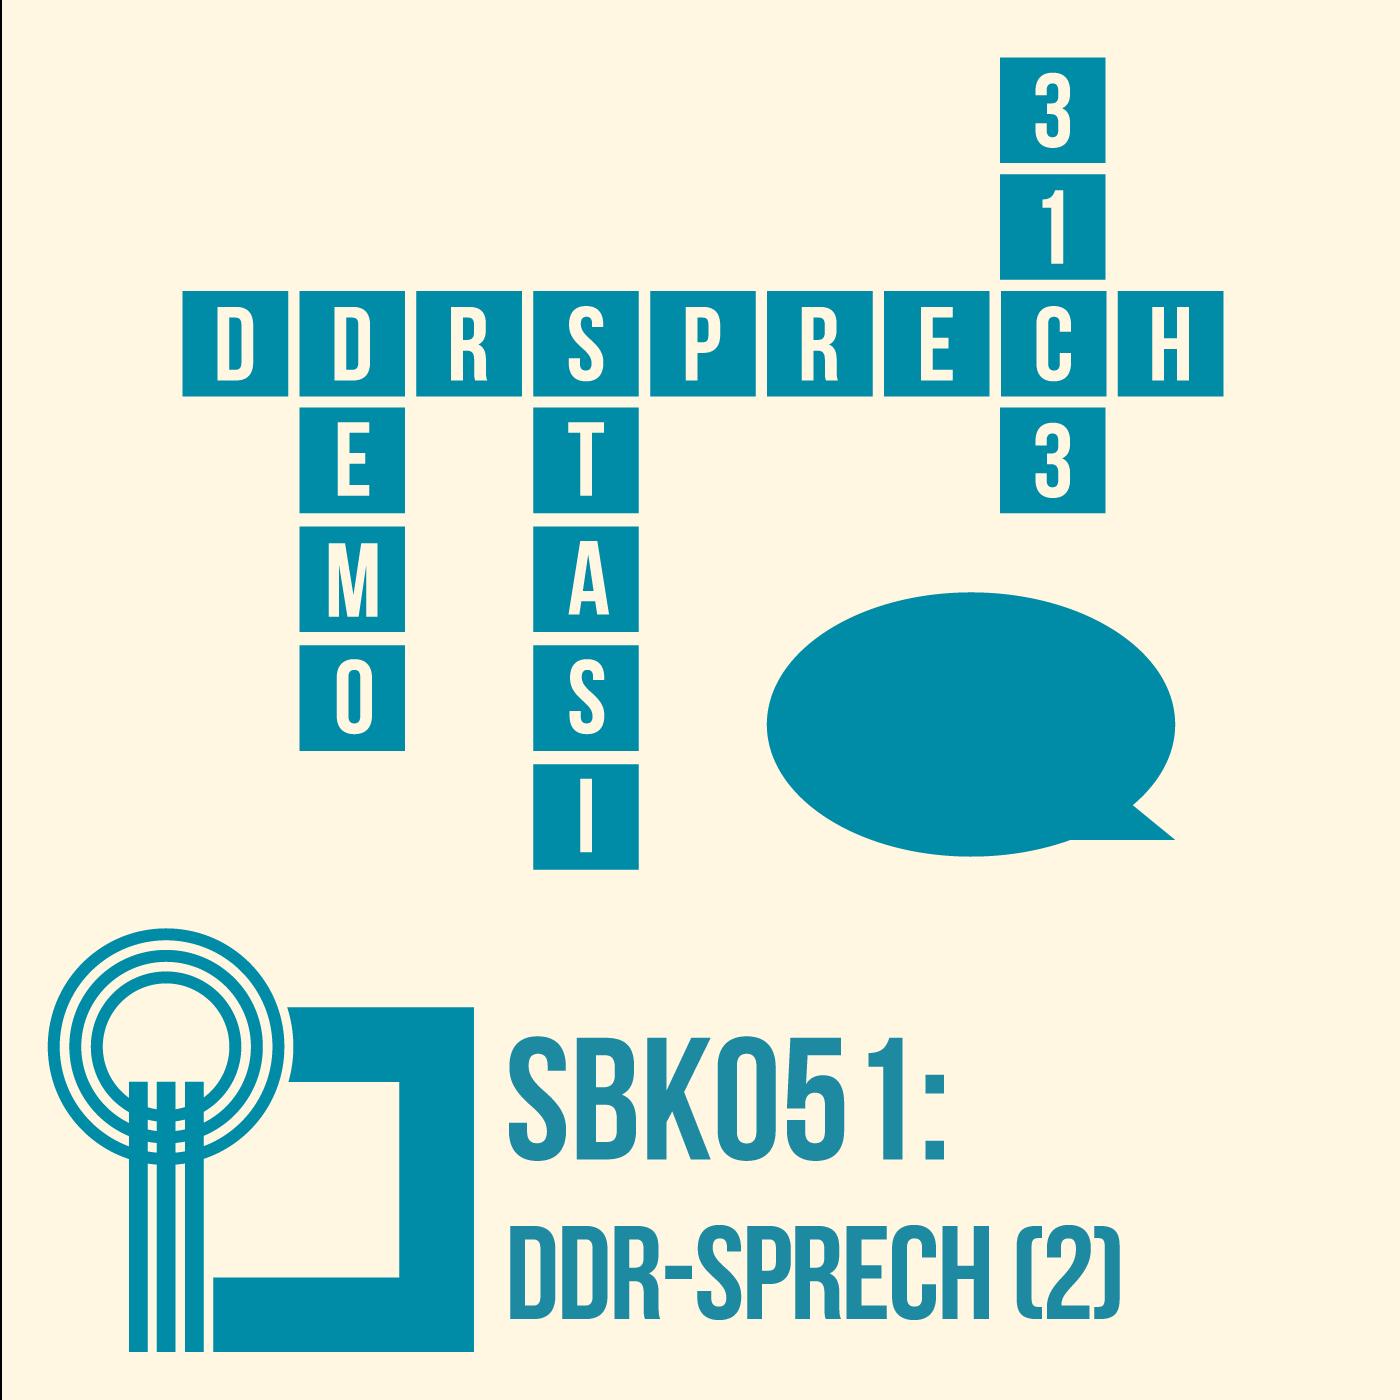 SBK051 DDR-Sprech (2)